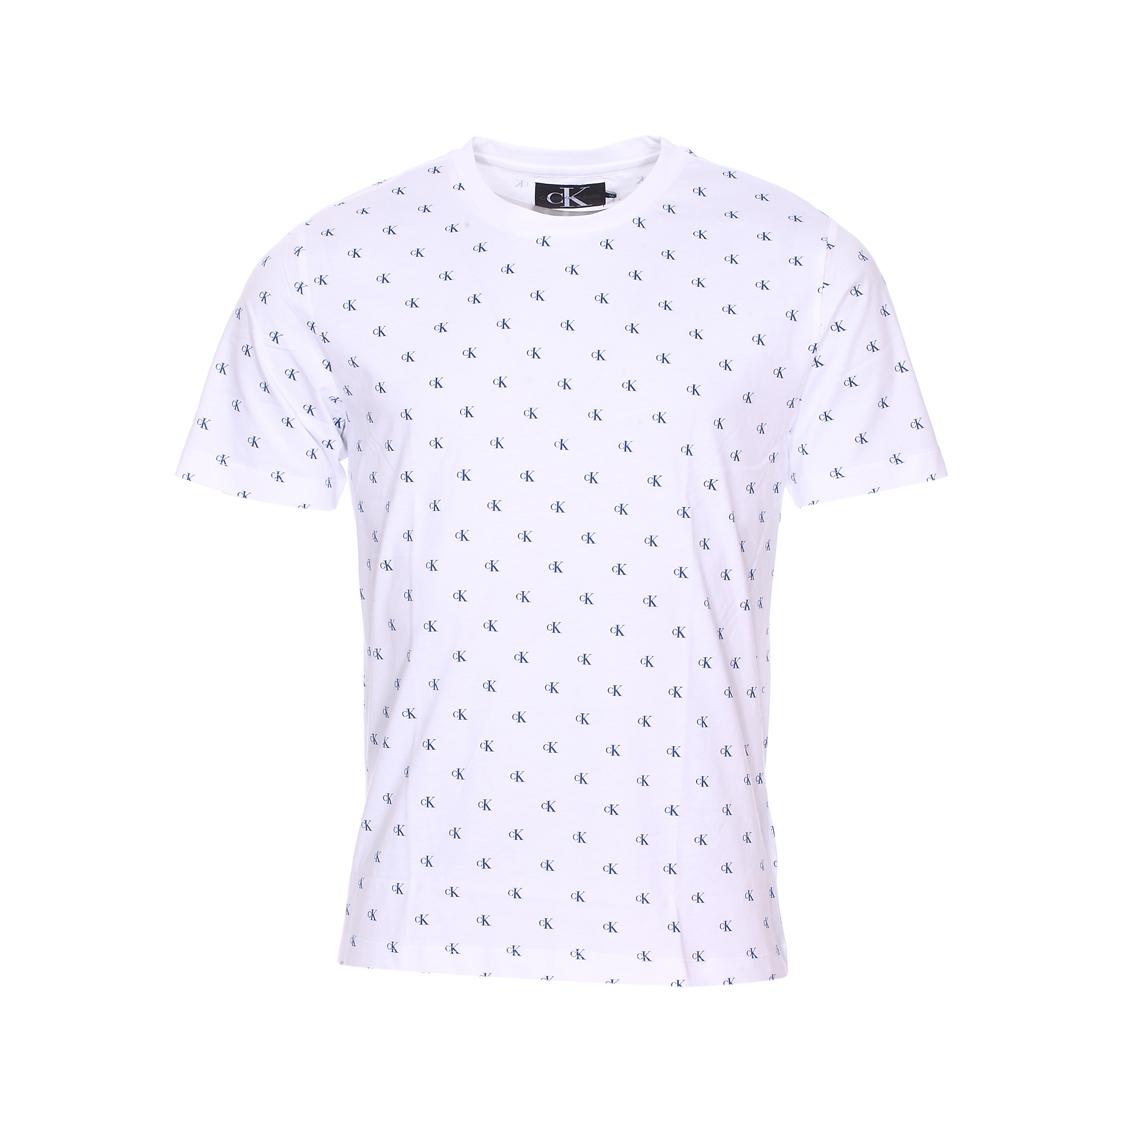 Tee-shirt col rond  monogram aop regular en coton blanc monogrammé en bleu marine